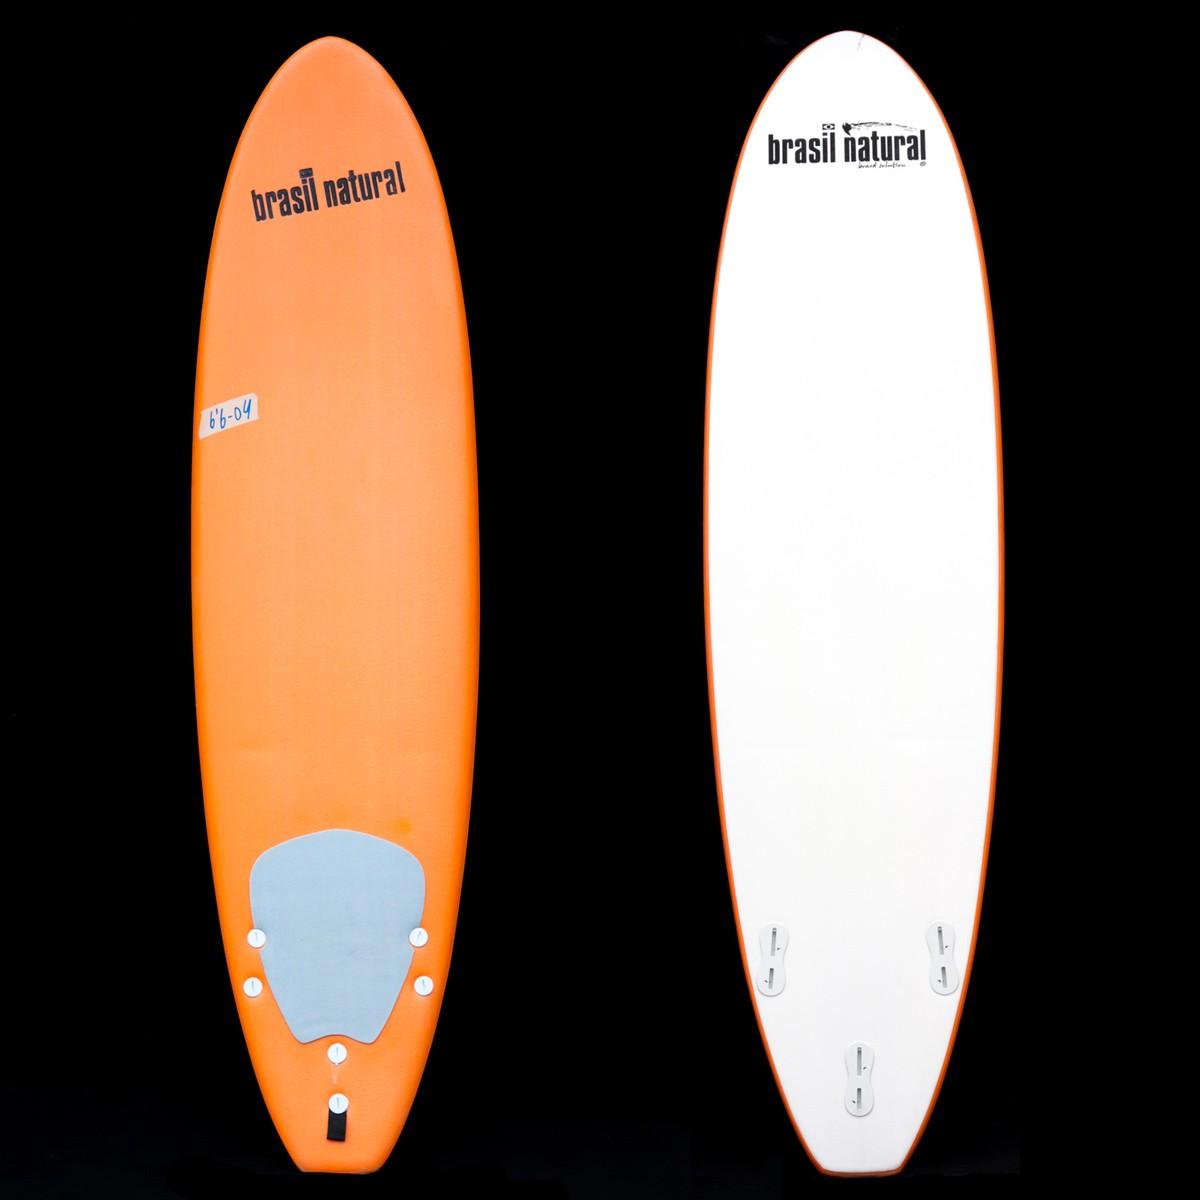 Prancha de surf infantil 6.6 NEW EDITION - OUTLET 04